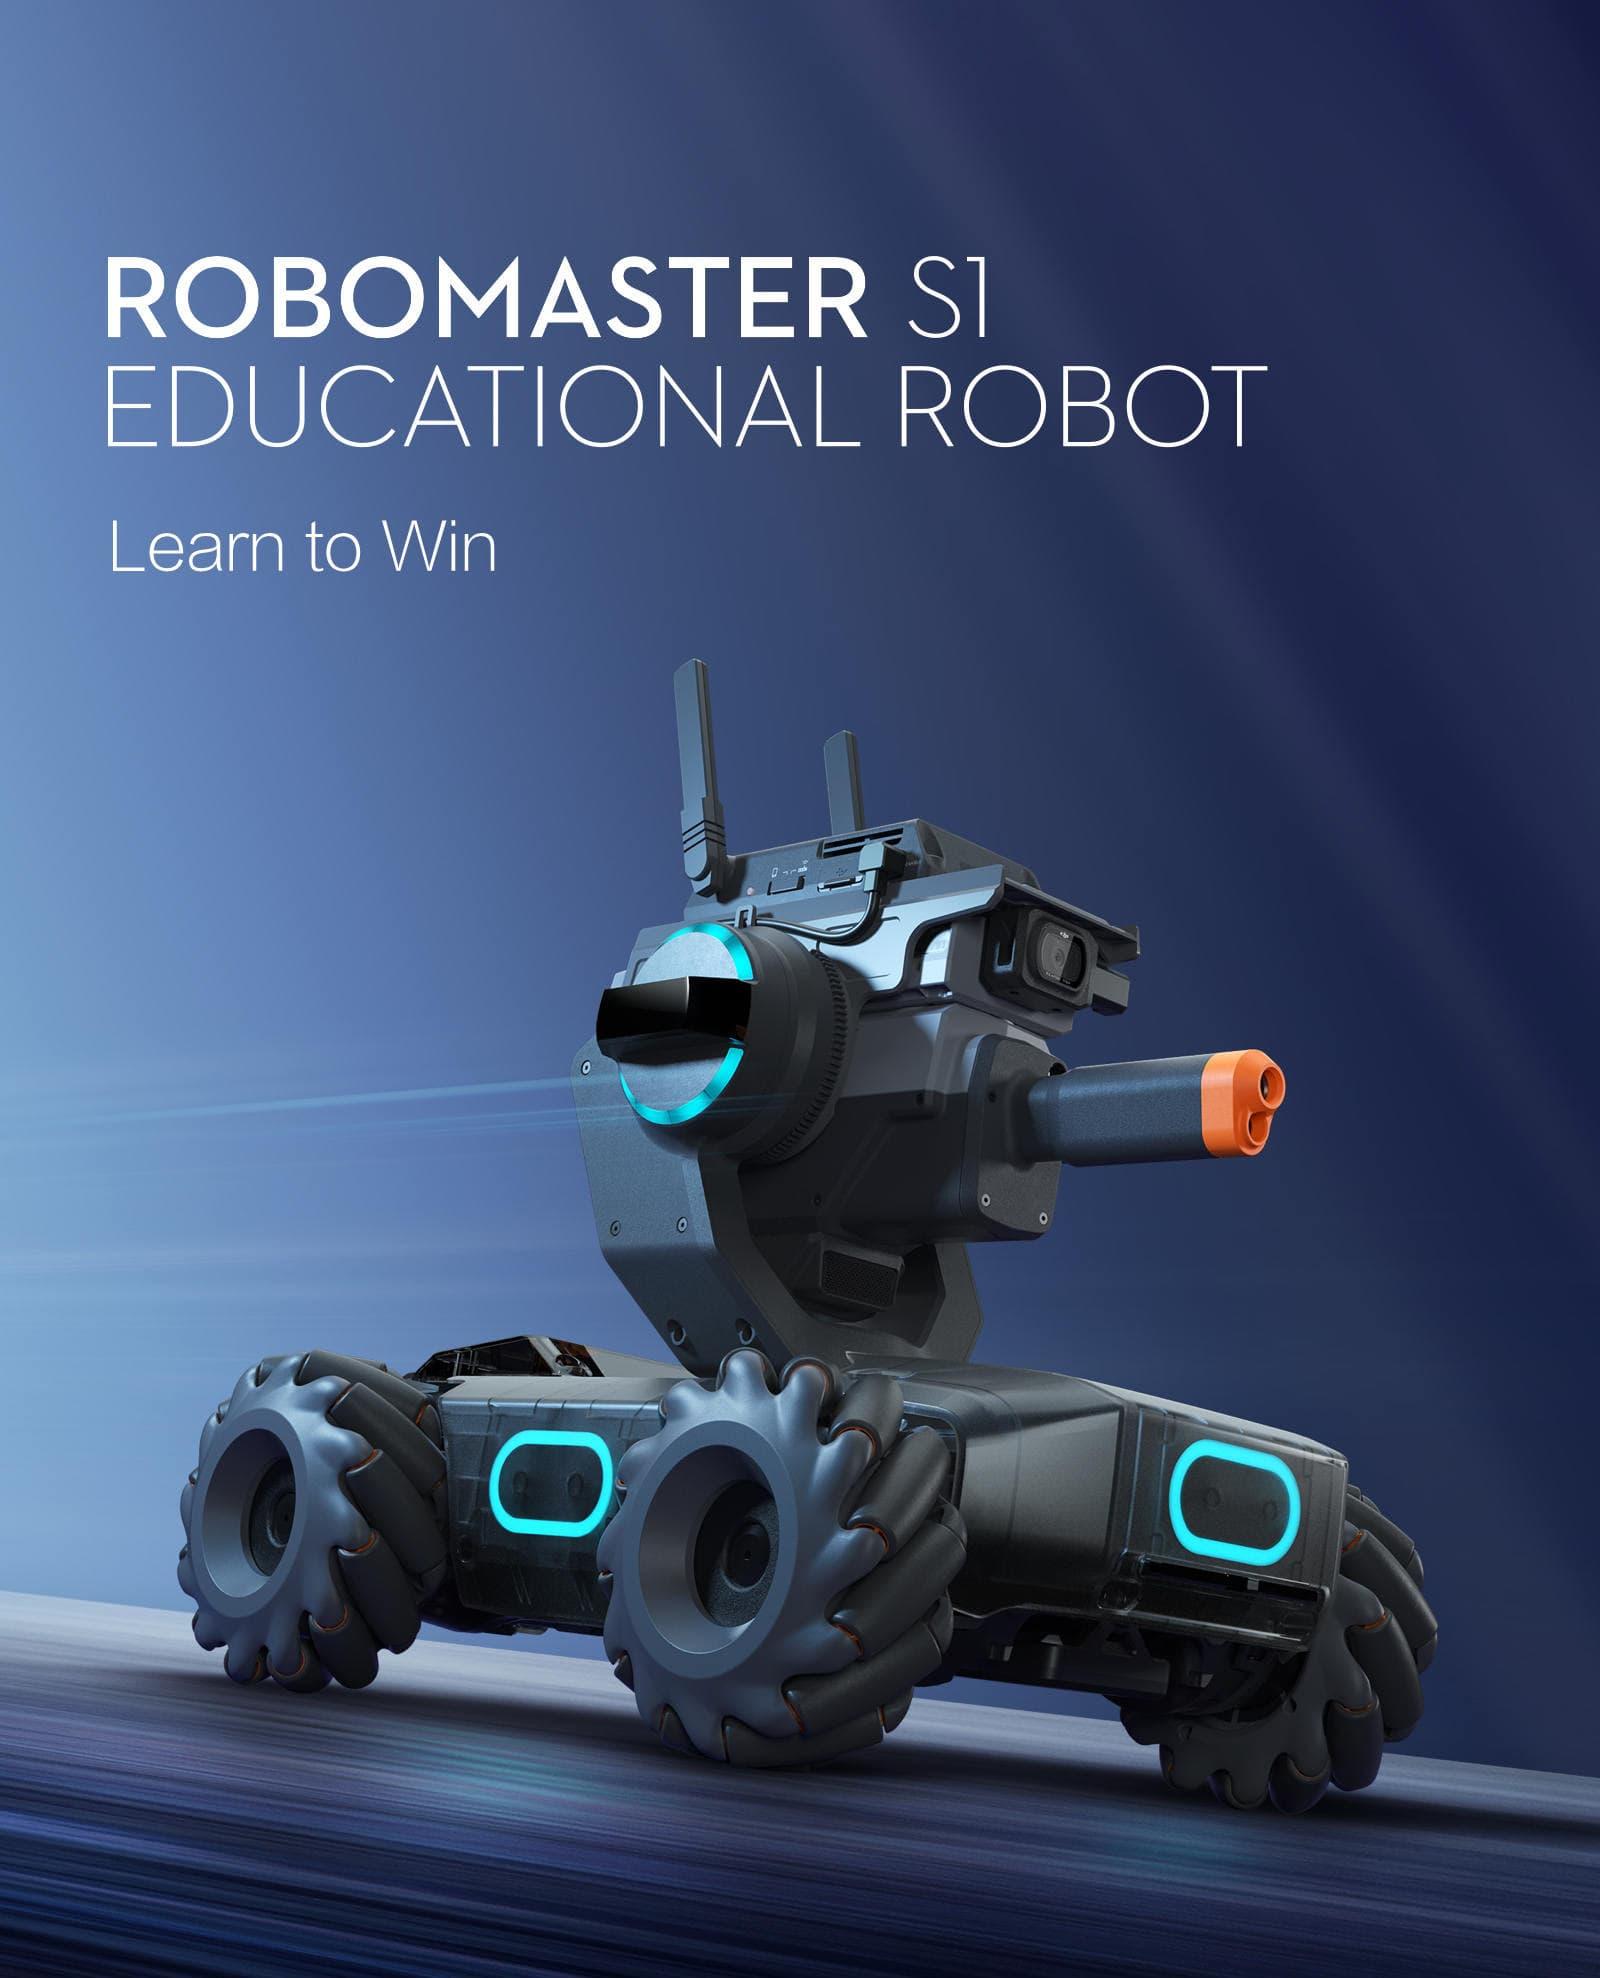 RoboMaster S1 - Educational Robot